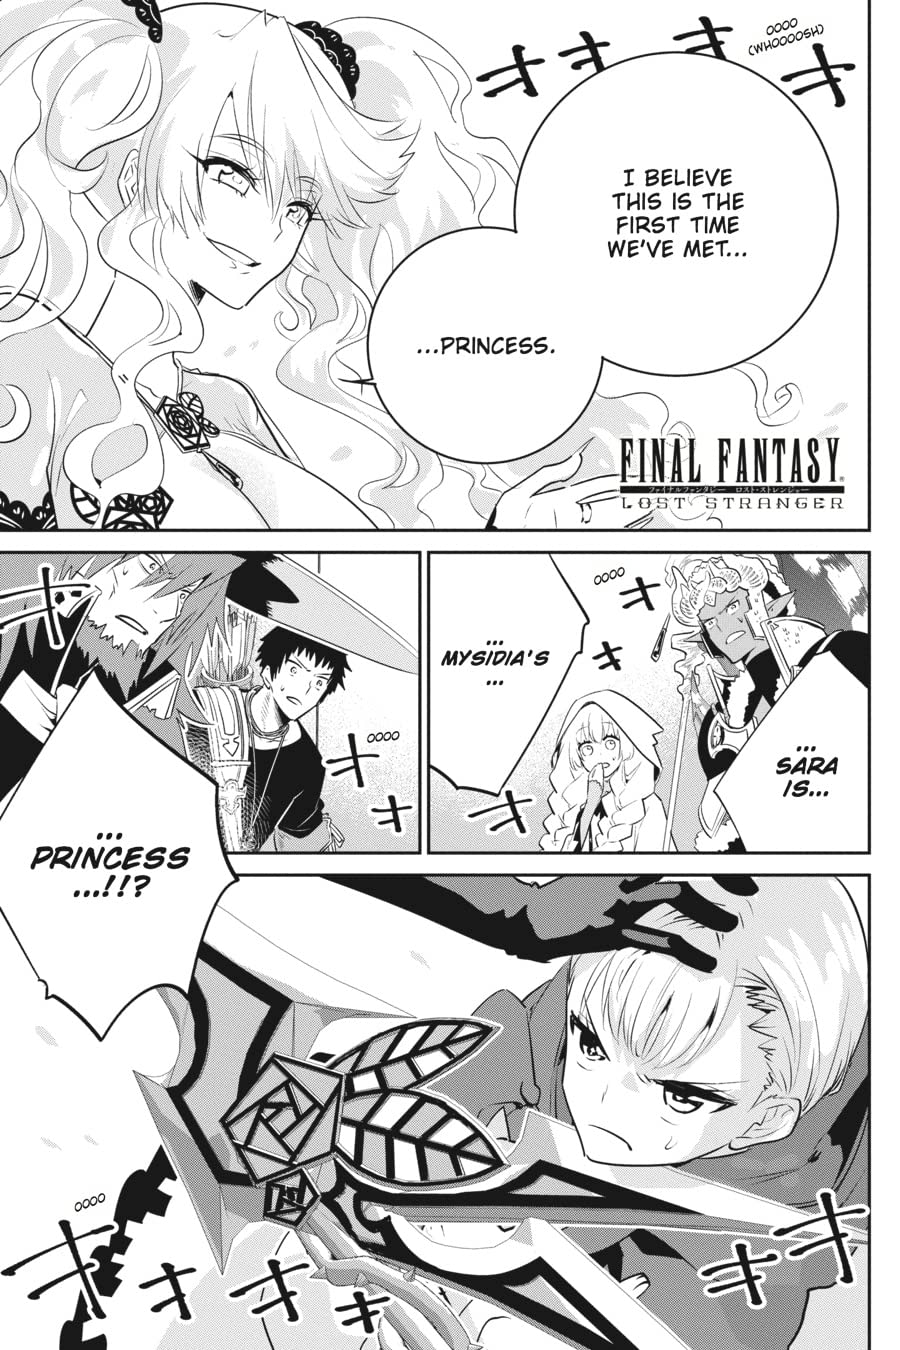 Final Fantasy Lost Stranger #8